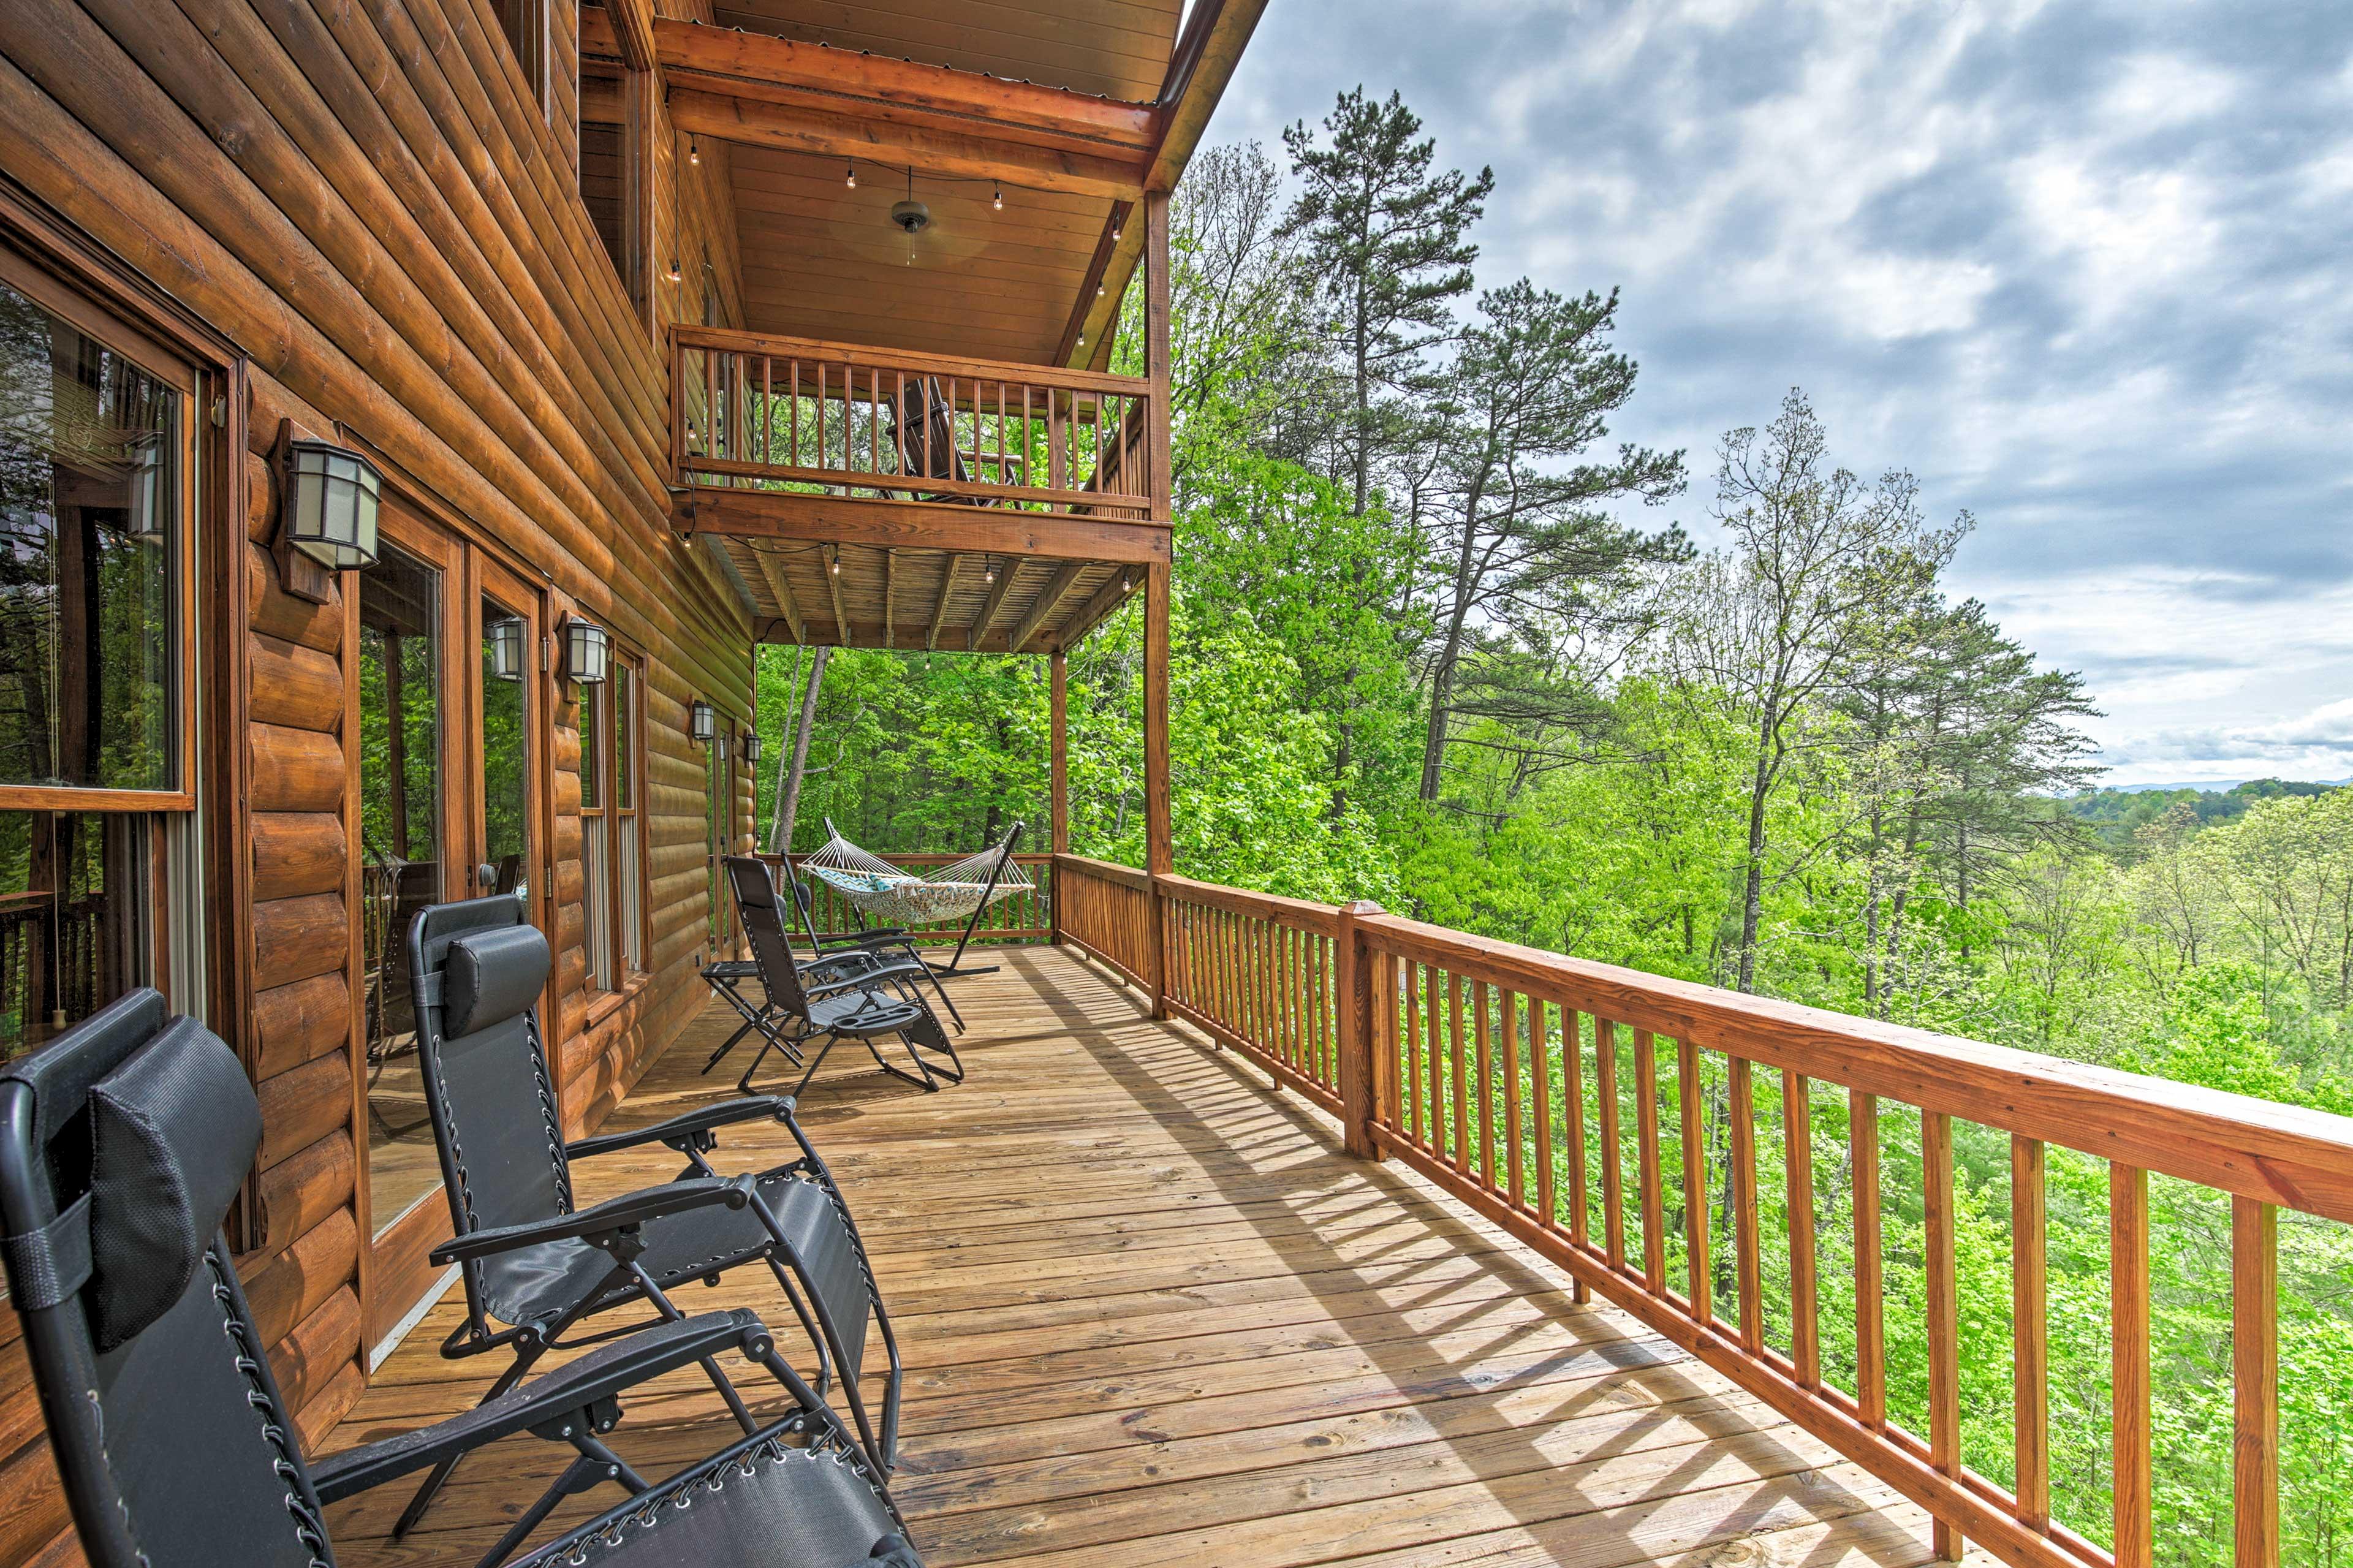 Morganton Vacation Rental | 4BR | 3BA | 3,338 Sq Ft | 3 Stories